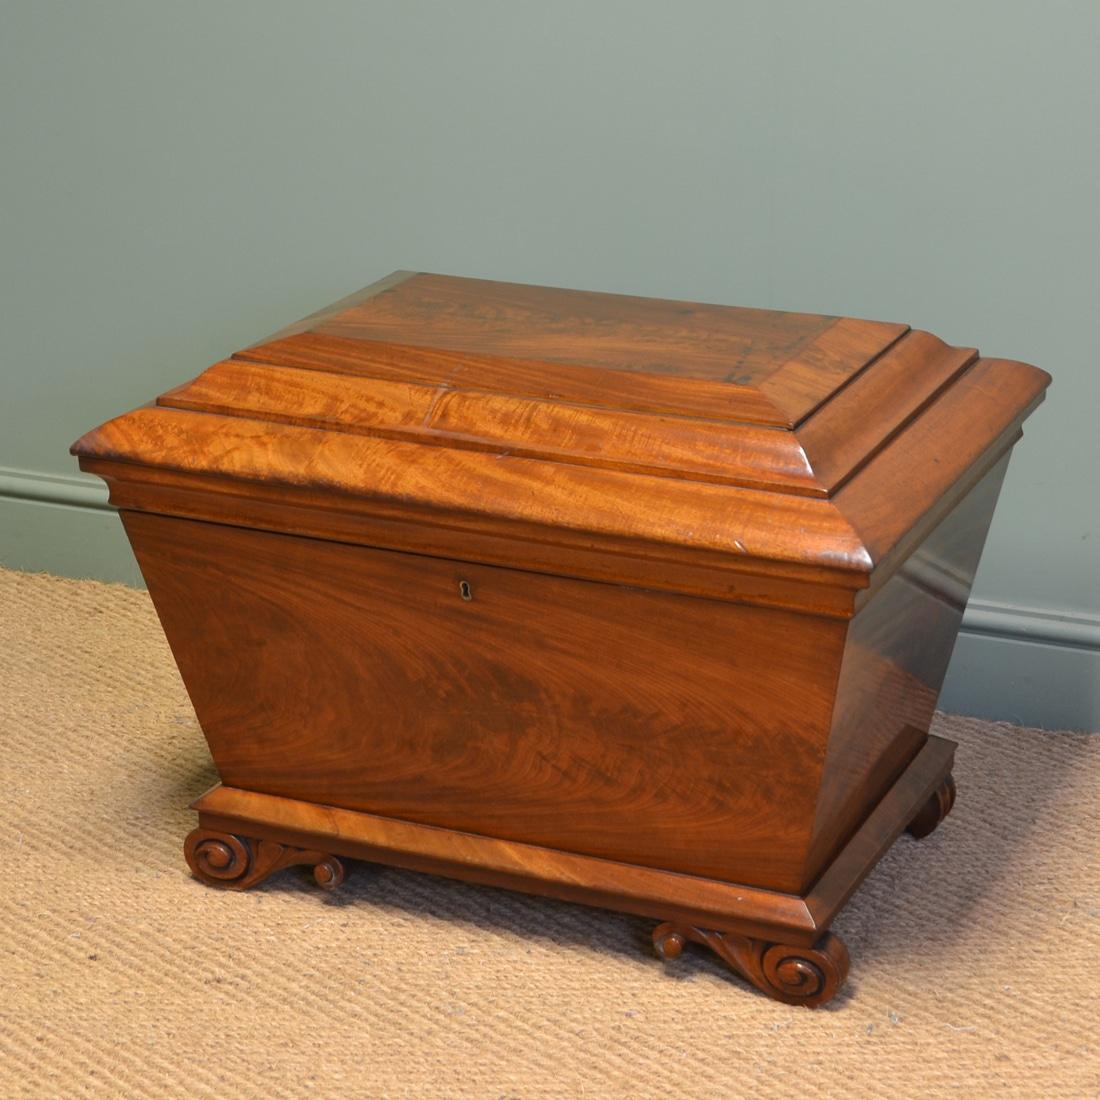 Rare Regency Figured Mahogany Large Antique Cellaret / Wine Box